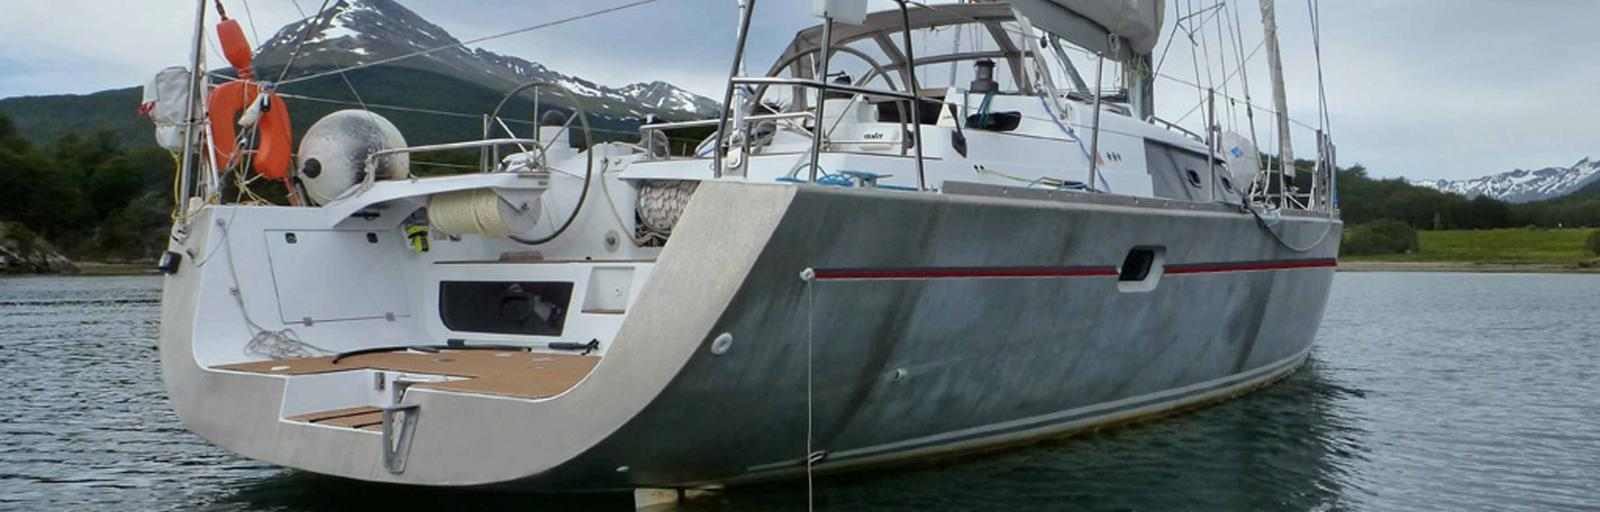 Azzuro 53 - AYC Yachtbroker